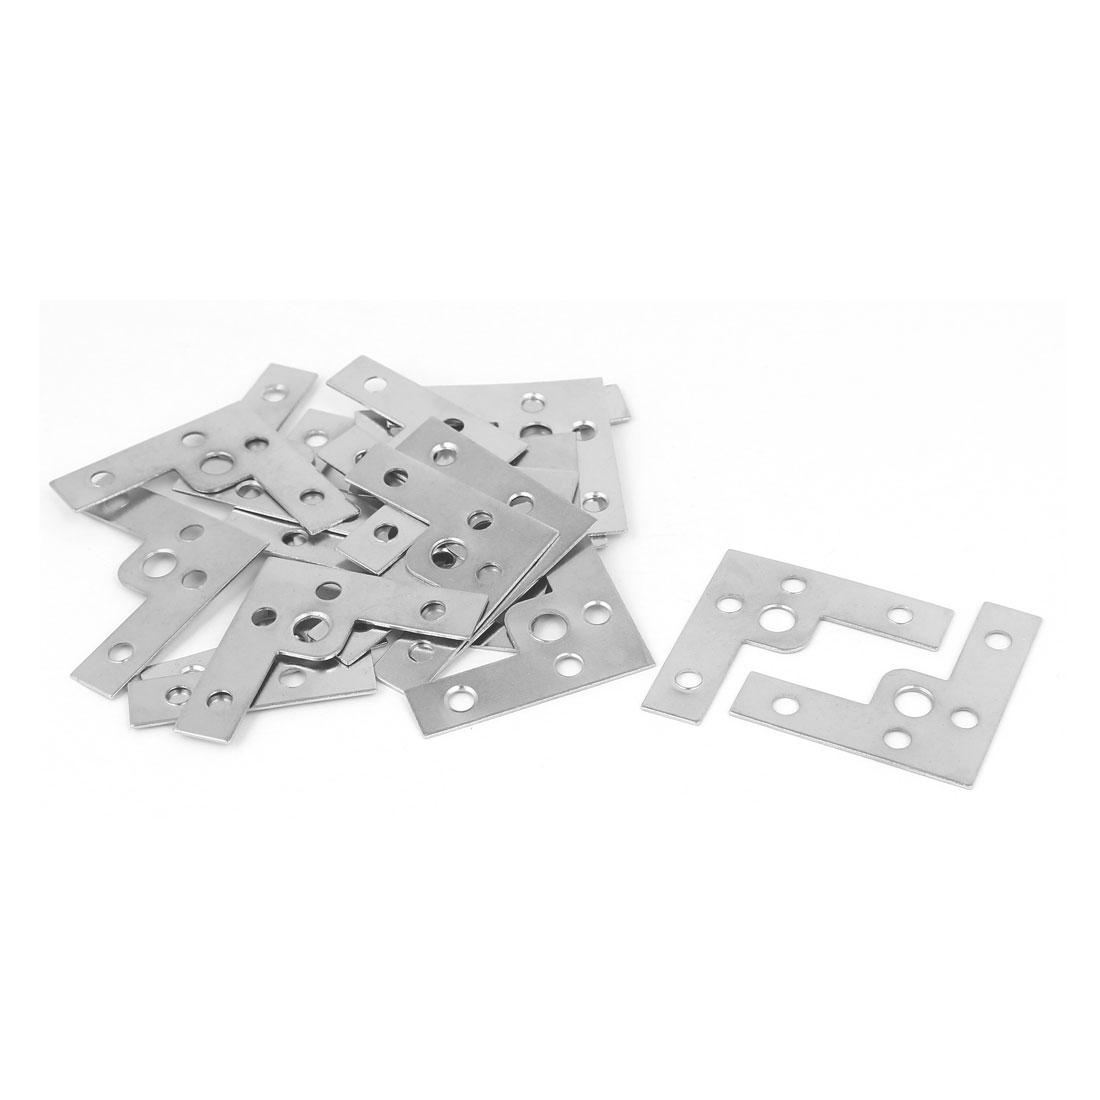 40mmx40mmx1mm L Shape Angle Bracket Corner Brace Flat Repair Plate 20pcs